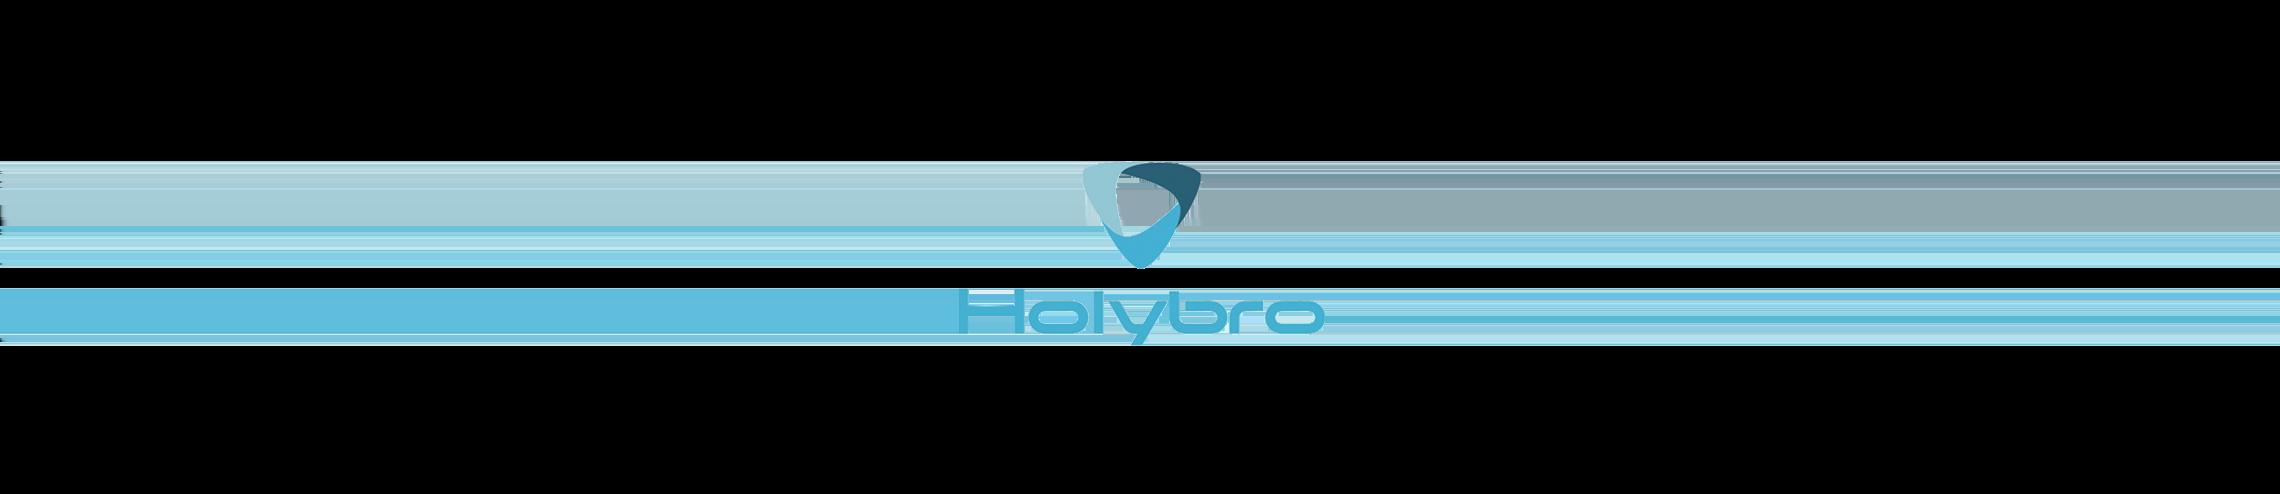 Holybro fpv banner promotion shop description mantisfpv